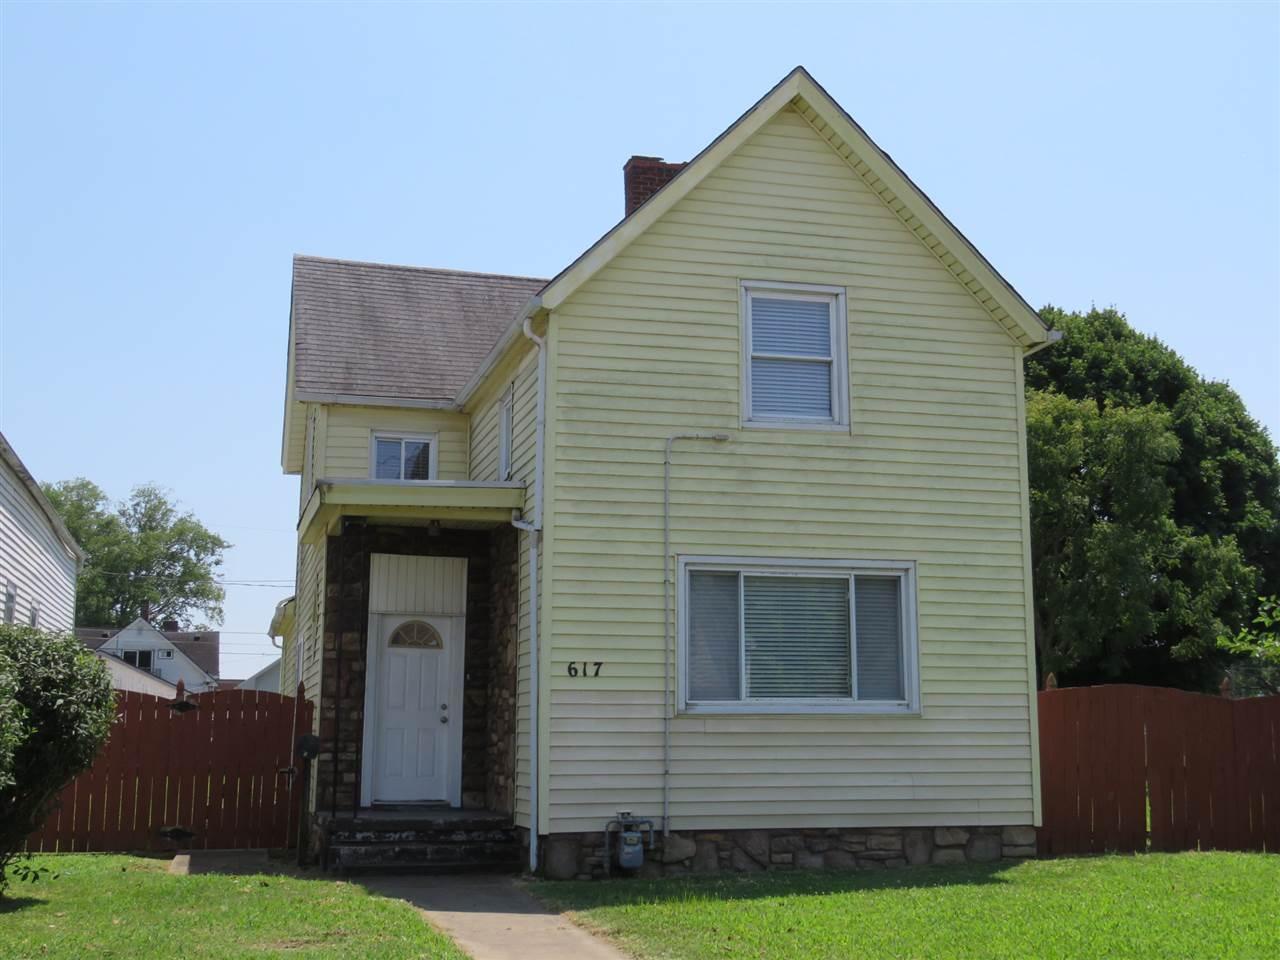 617 E Columbia Street, Evansville, IN 47711